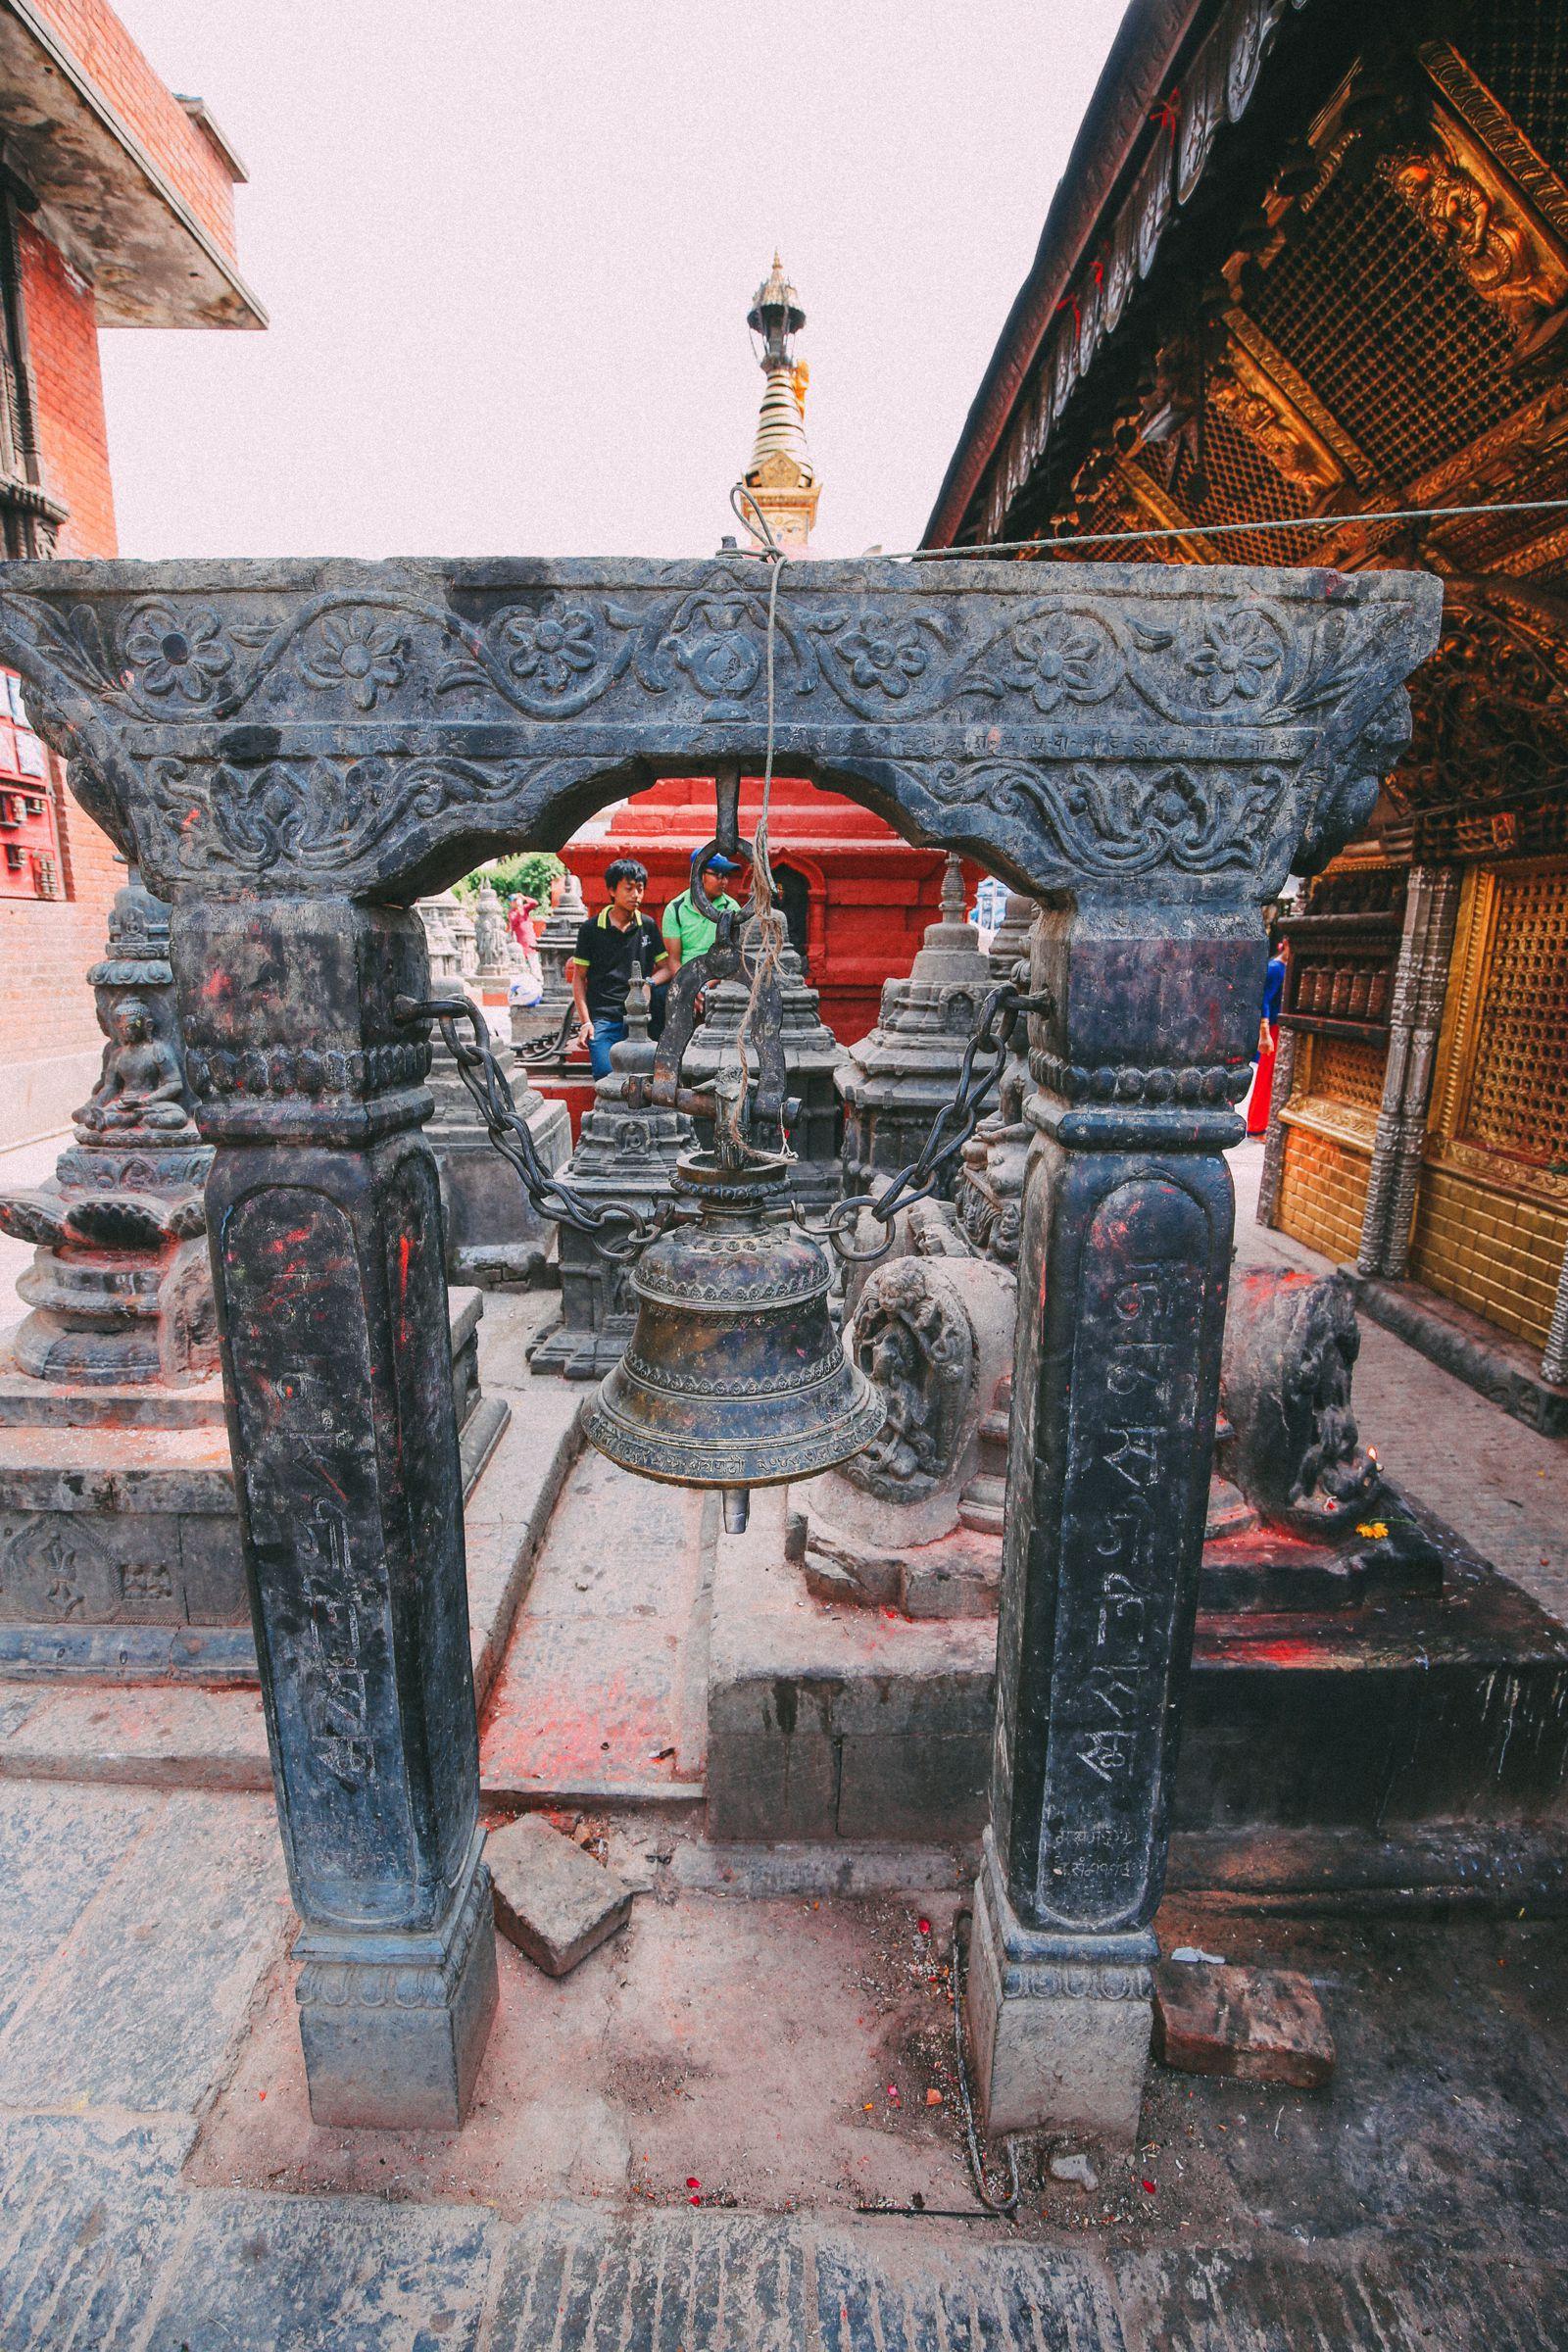 Exploring Swayambhunath Stupa - The Monkey Temple In Kathmandu, Nepal (15)